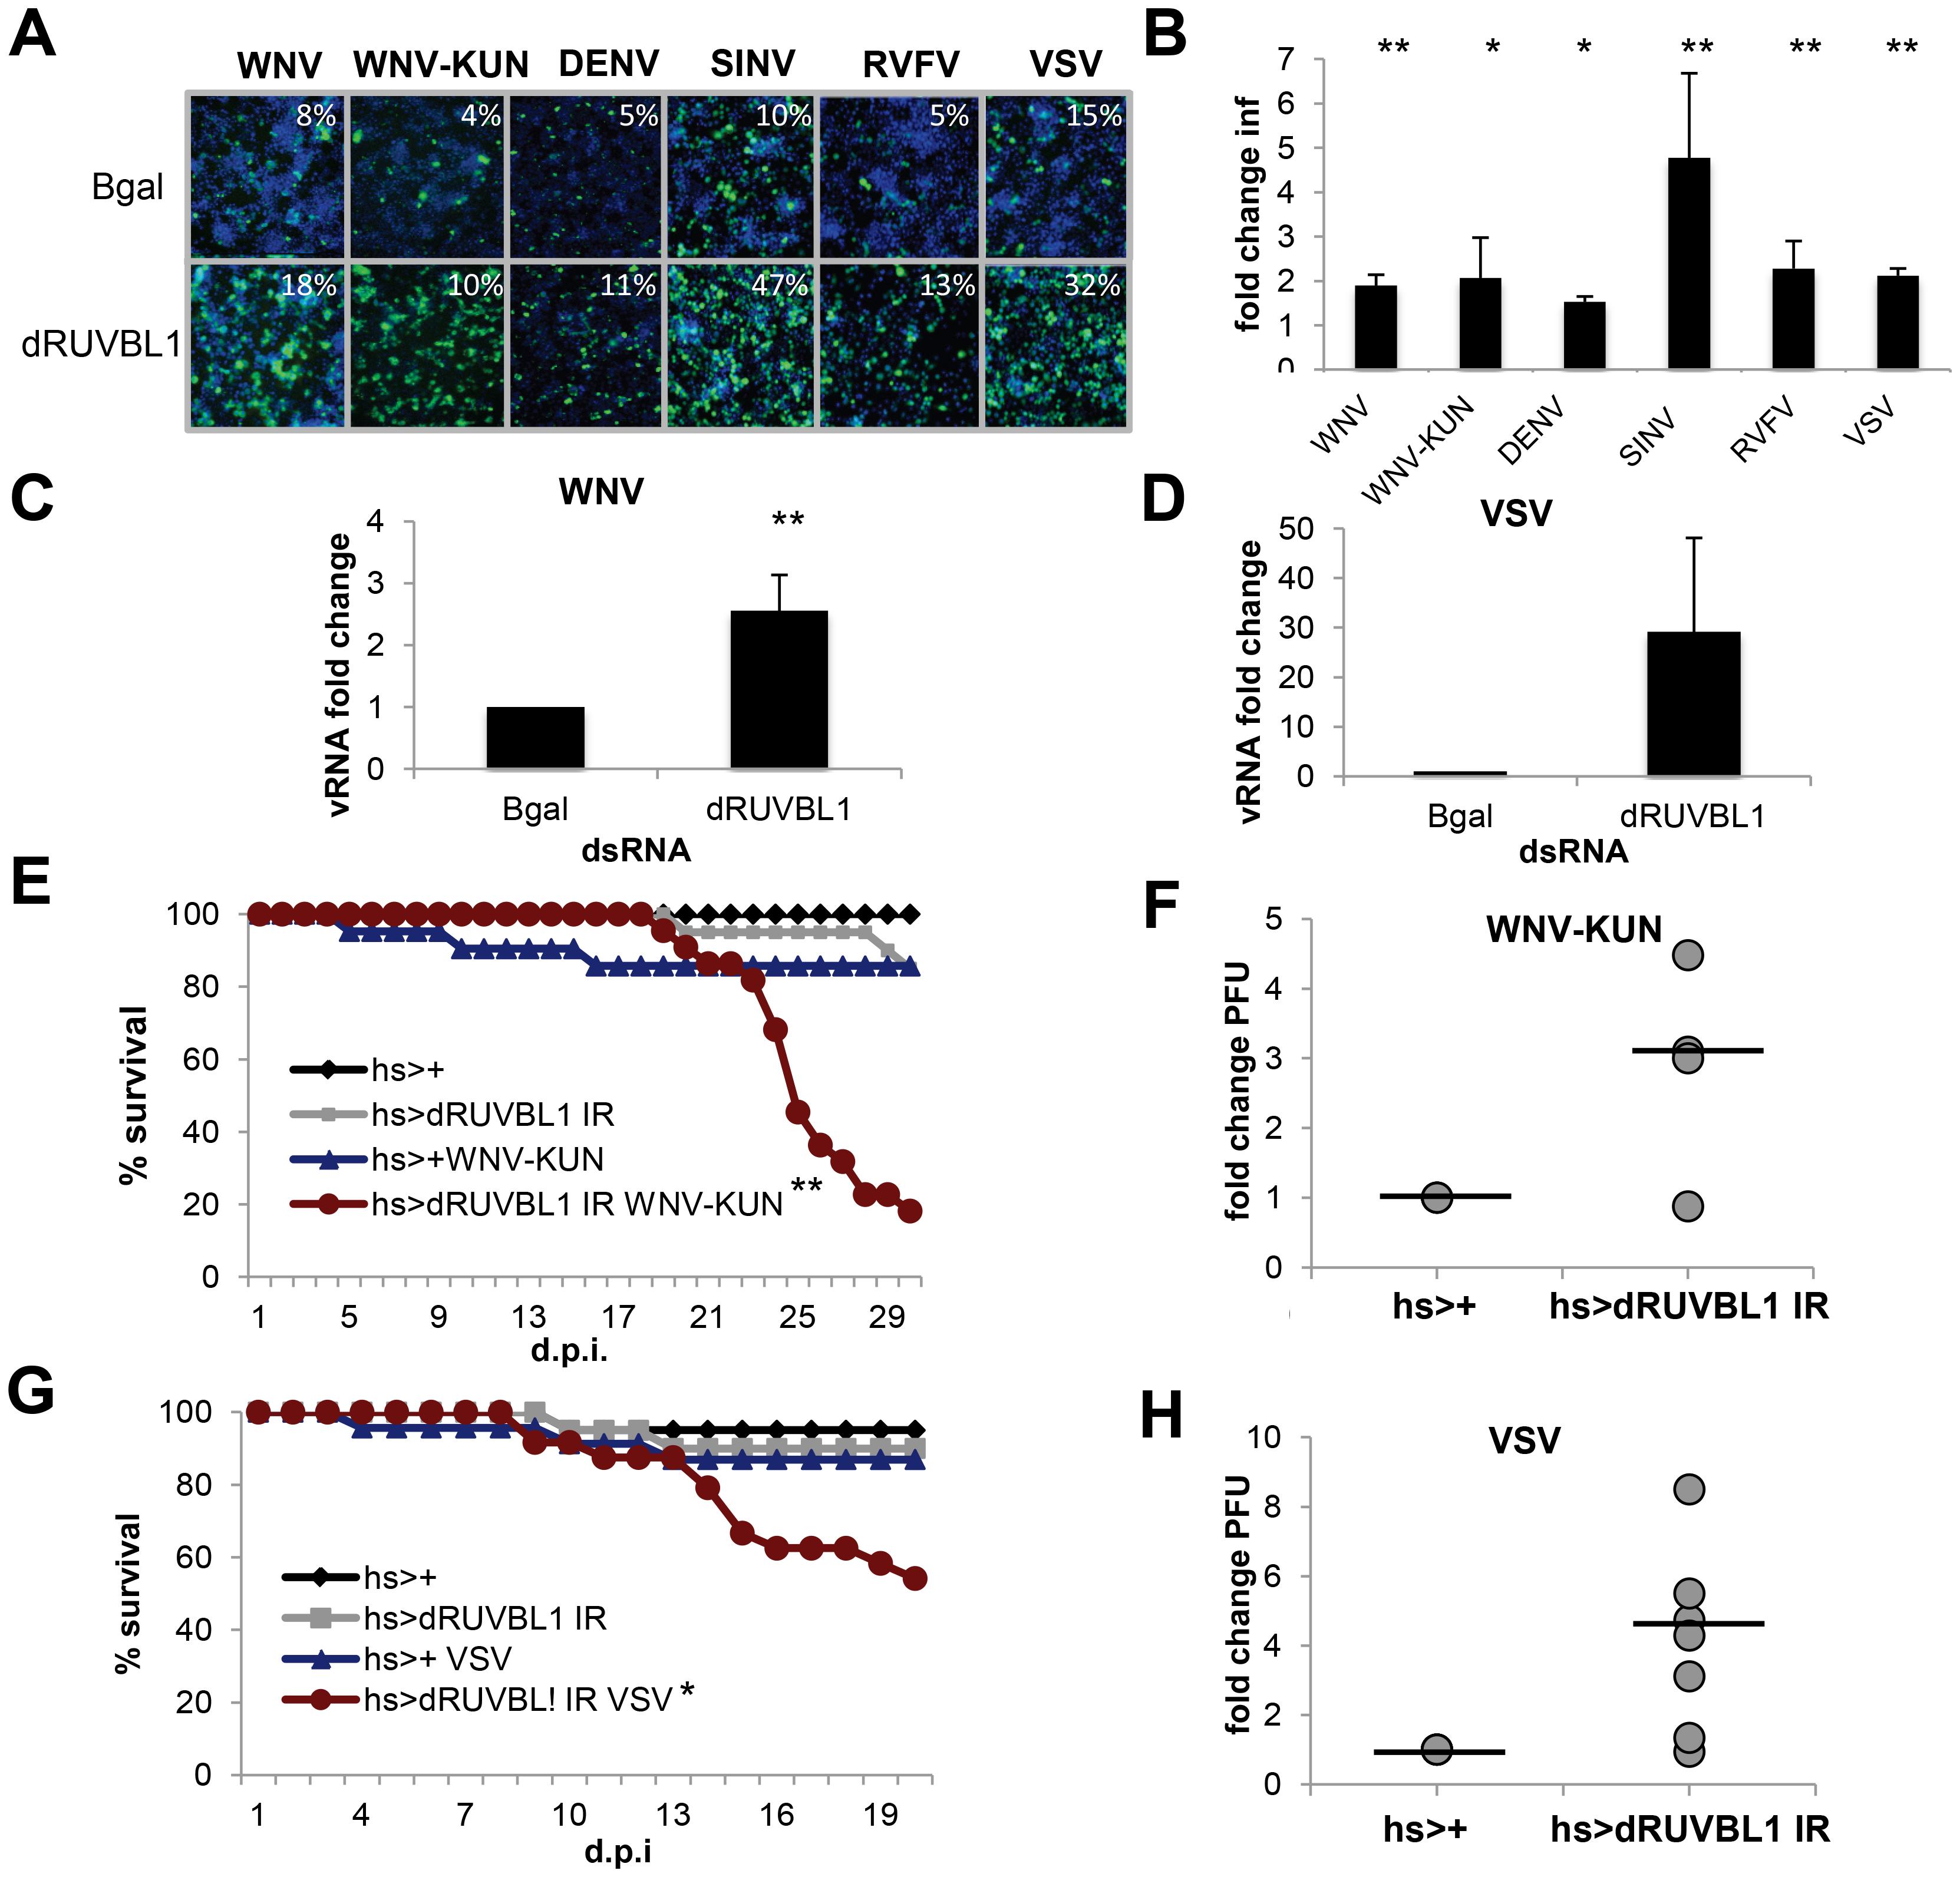 dRUVBL1 is a broadly antiviral gene.